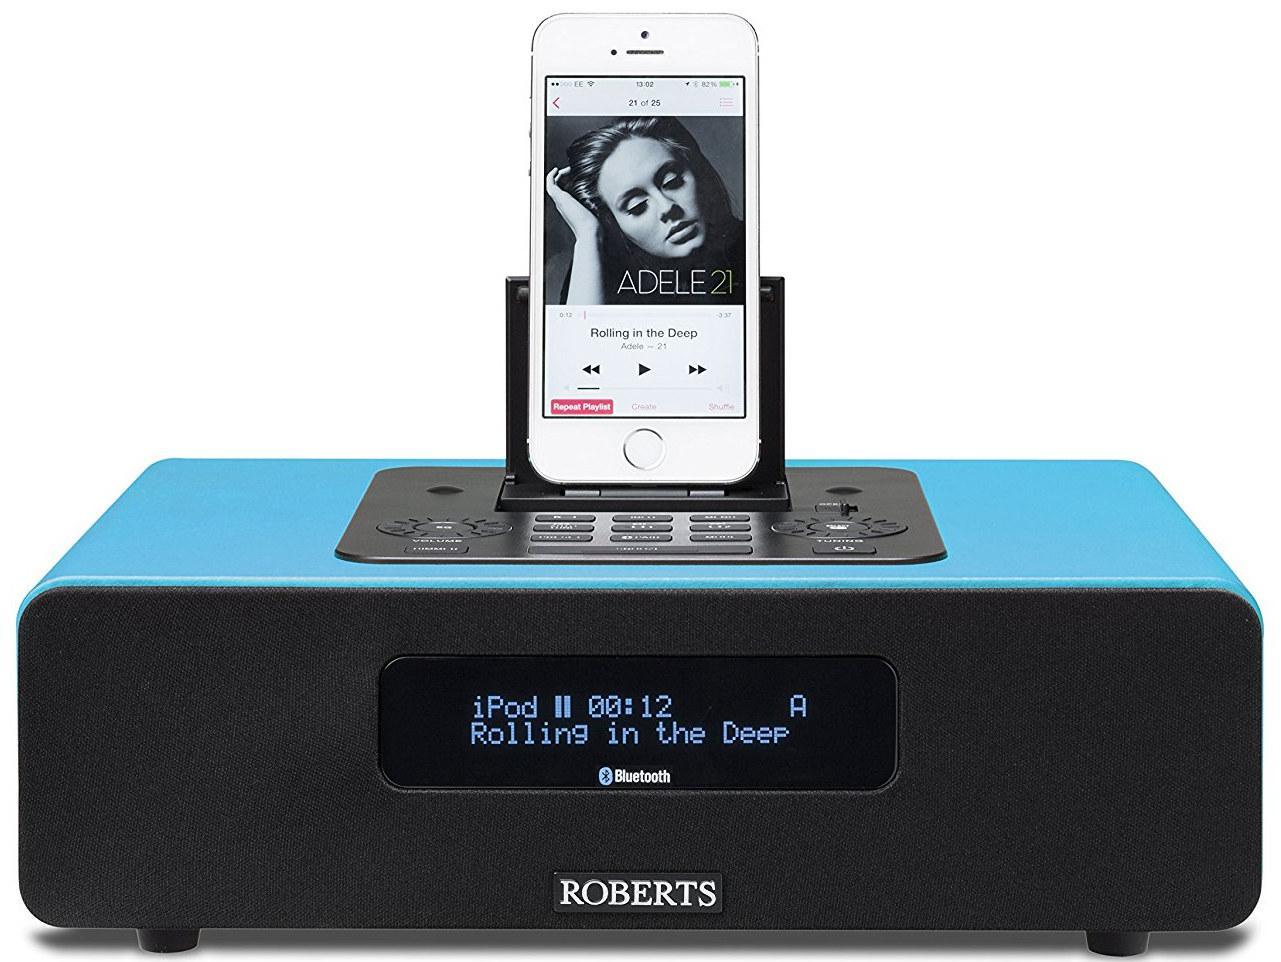 roberts radio blutune65 dab fm bluetooth lightning dock 2 1 soundsystem mit fernbedienung. Black Bedroom Furniture Sets. Home Design Ideas